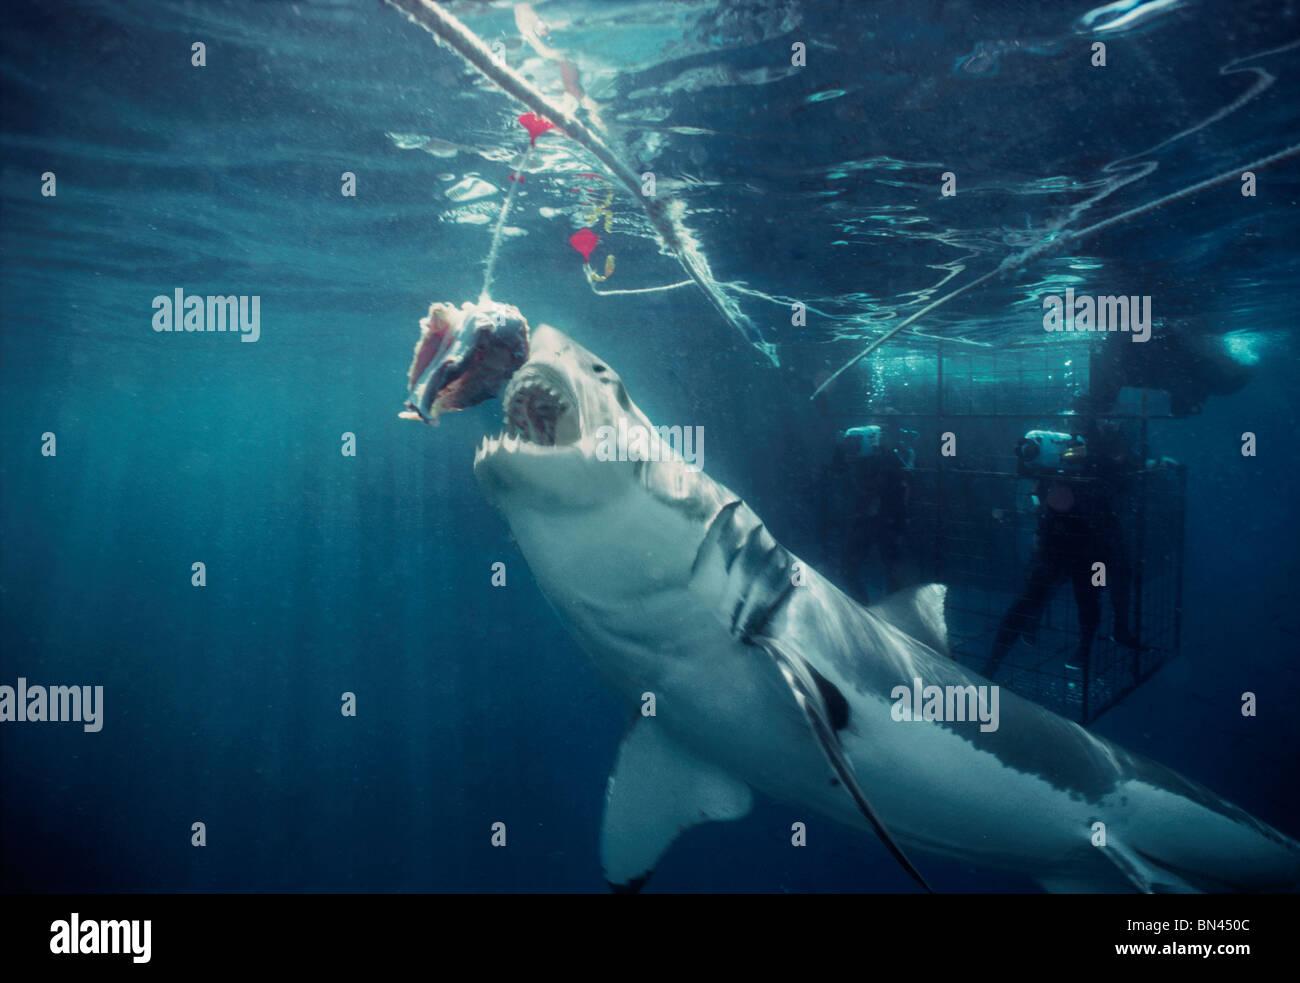 Great White Shark Australia | Divers Filming Great White Shark Carcharodon Carcharias Attacking